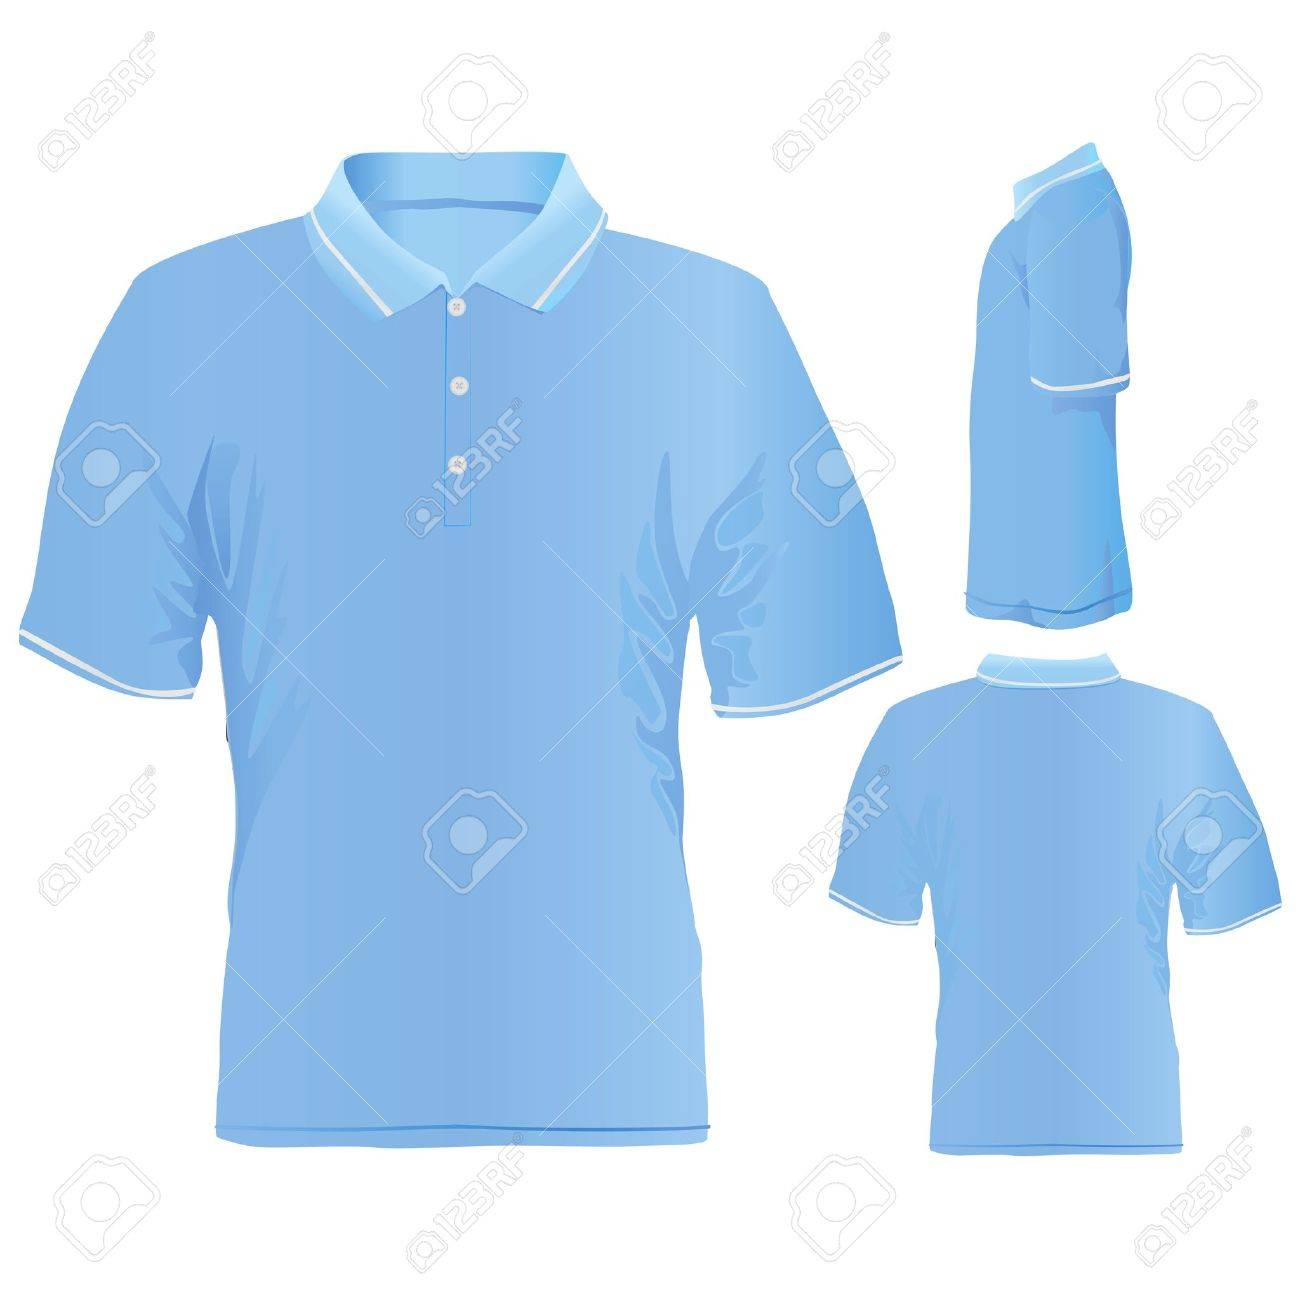 Design t shirt collar - T Shirt Vector Royalty Free Cliparts Vectors And Stock